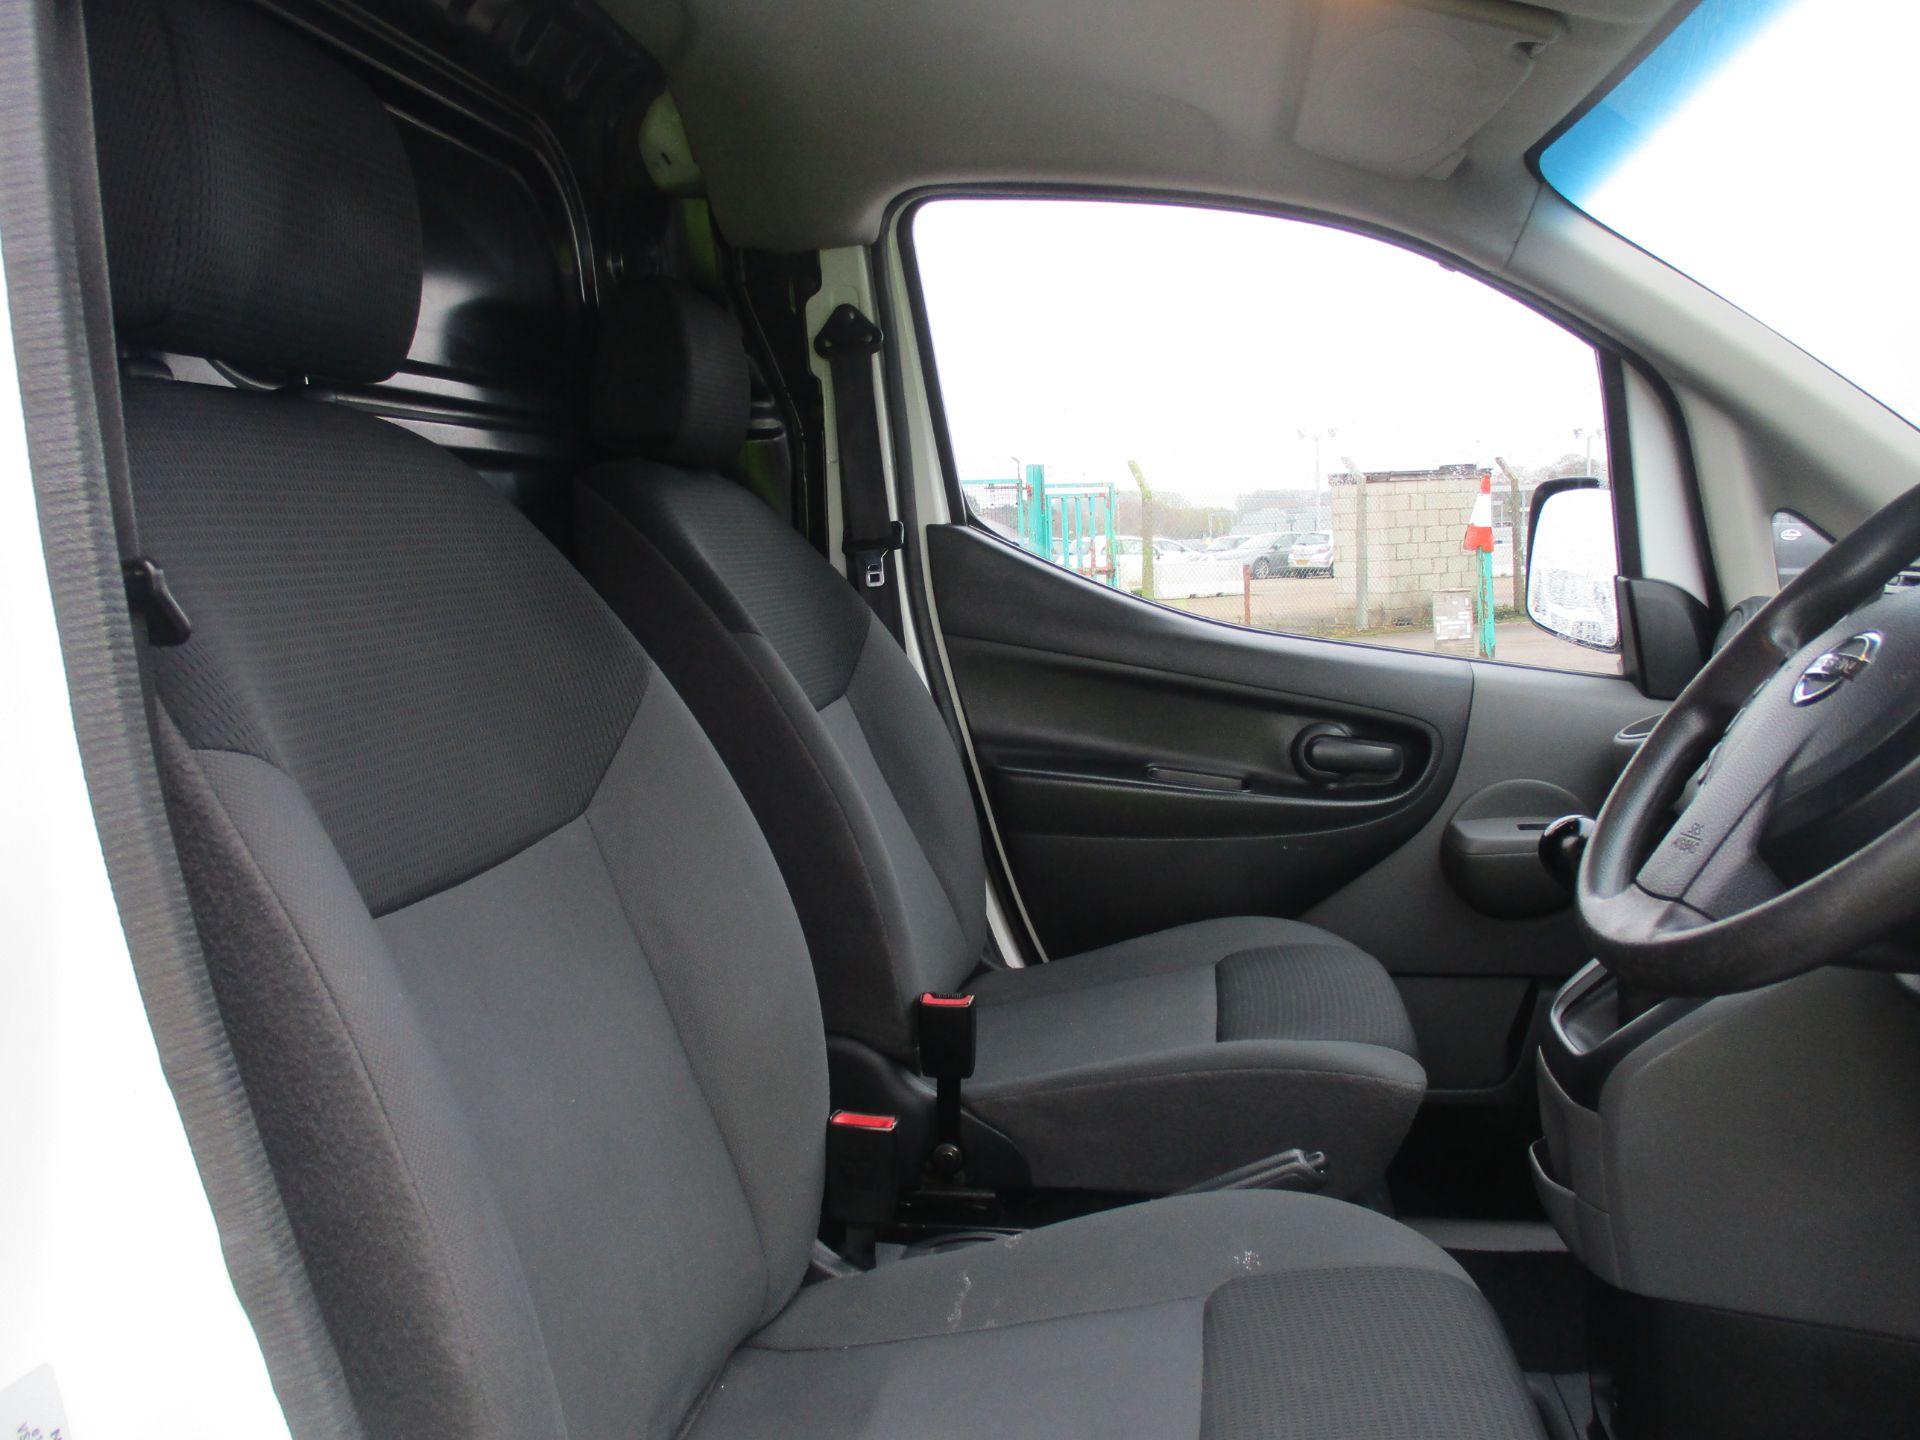 2014 Nissan Nv200 1.5 DCI ACENTA EURO 5 (SJ14YBR) Image 13